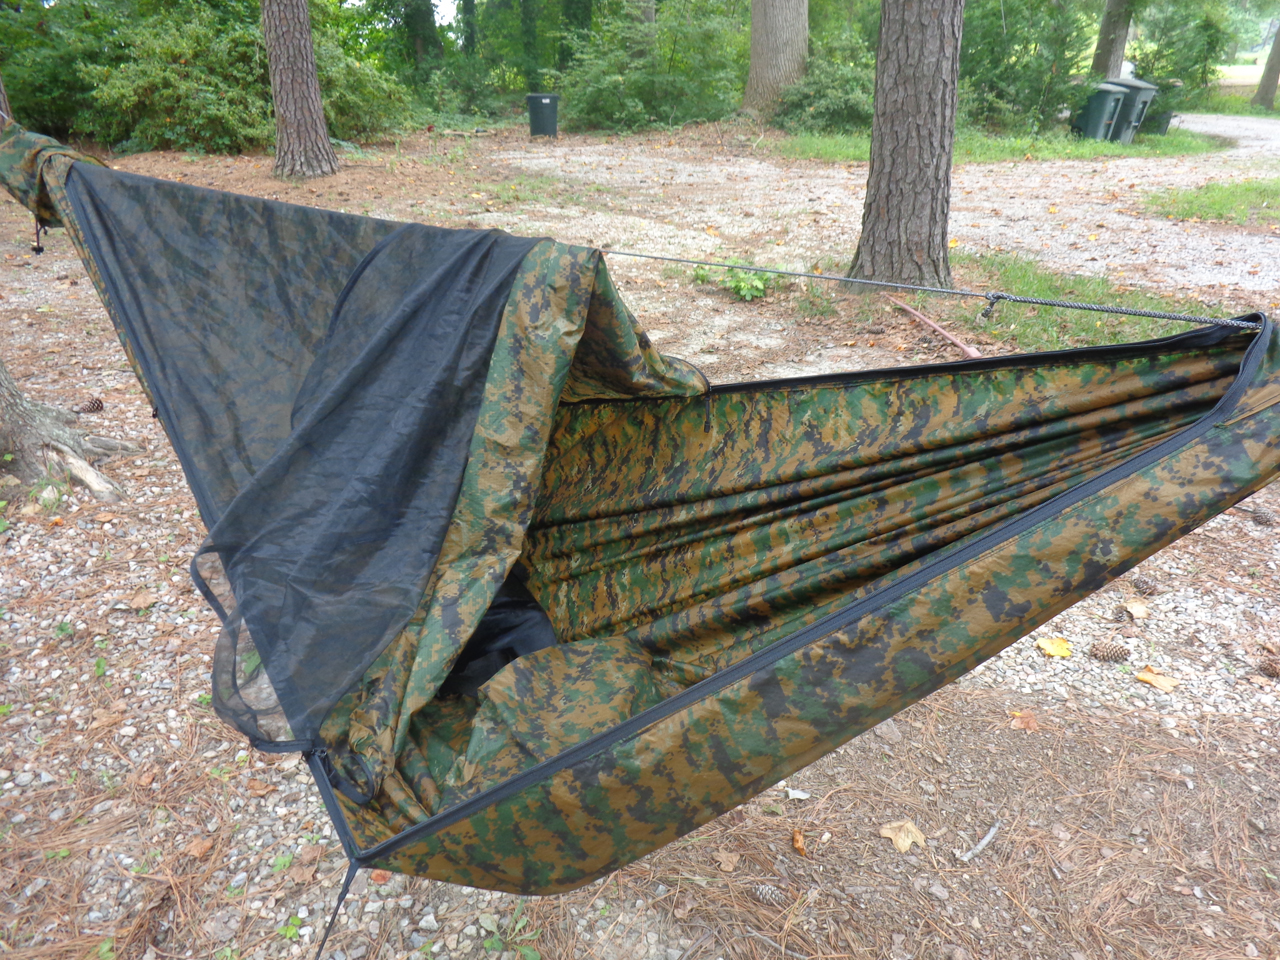 diy  dl 1 1oz 30d marpat hammock w bug  and topcover diy  dl 1 1oz 30d marpat hammock w bug  and topcover   hammock      rh   hammockforums